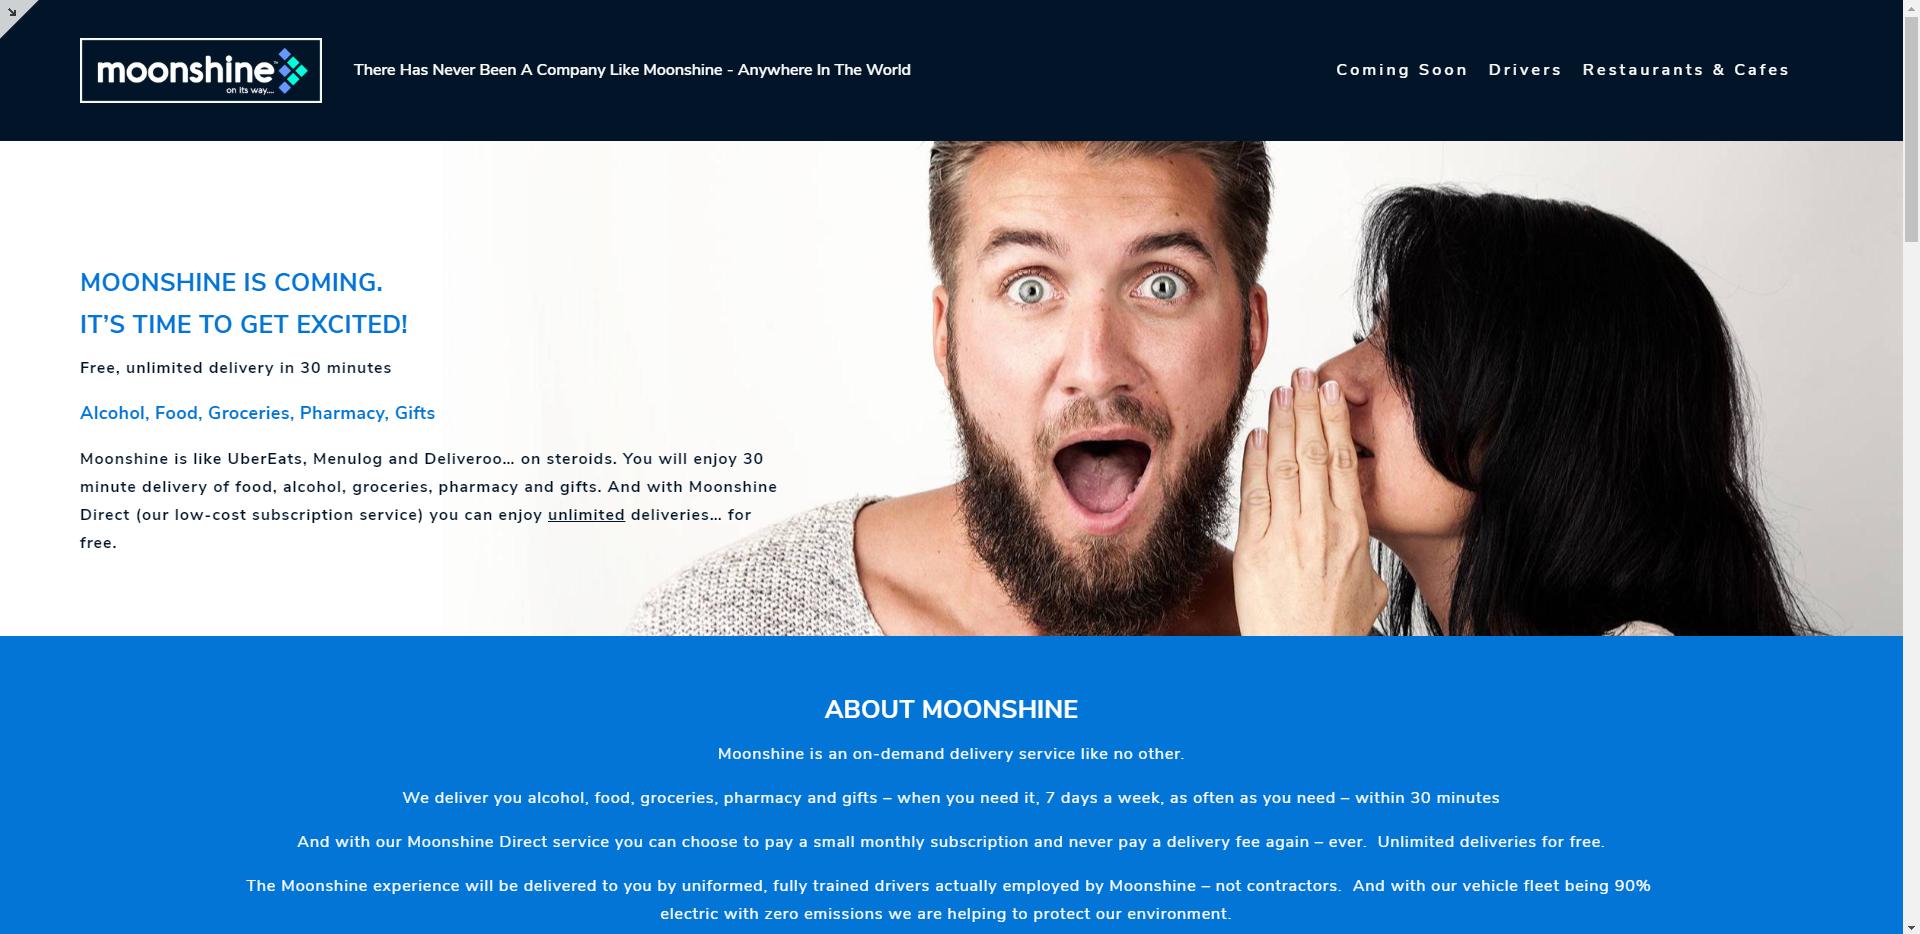 Website SEO